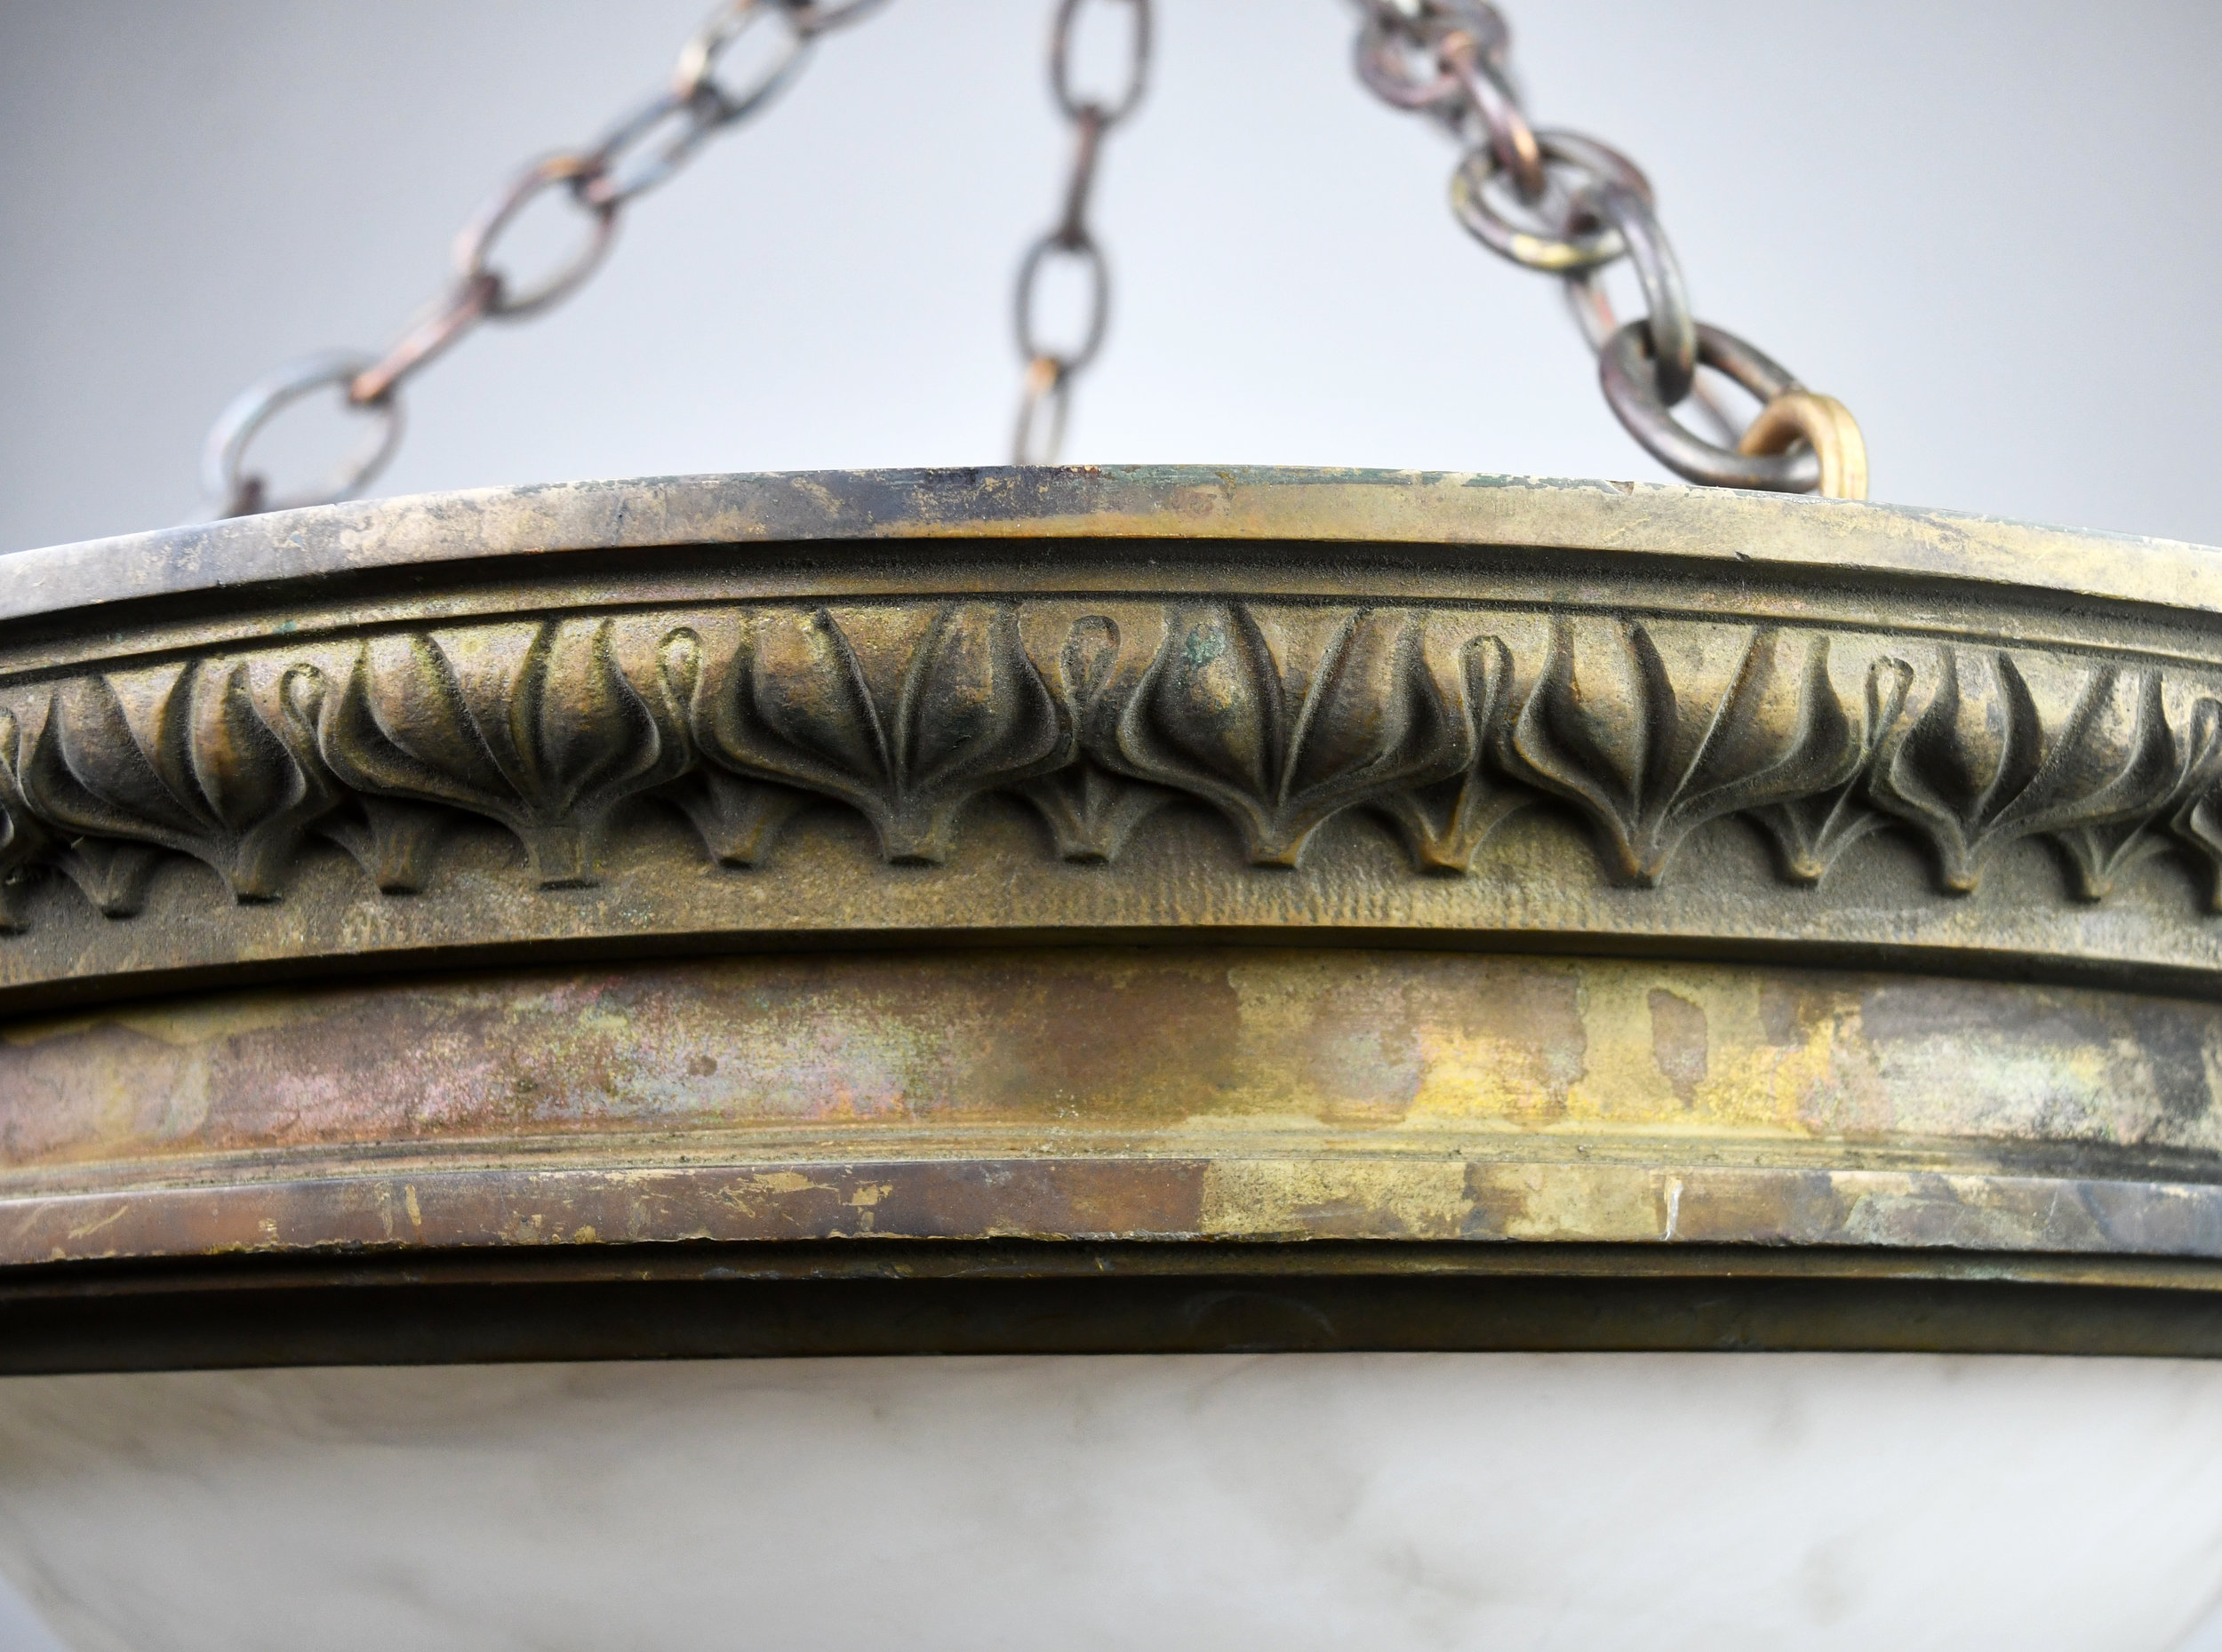 47129-cast-bronze-acrylic-bowl-fixture-detail.JPG